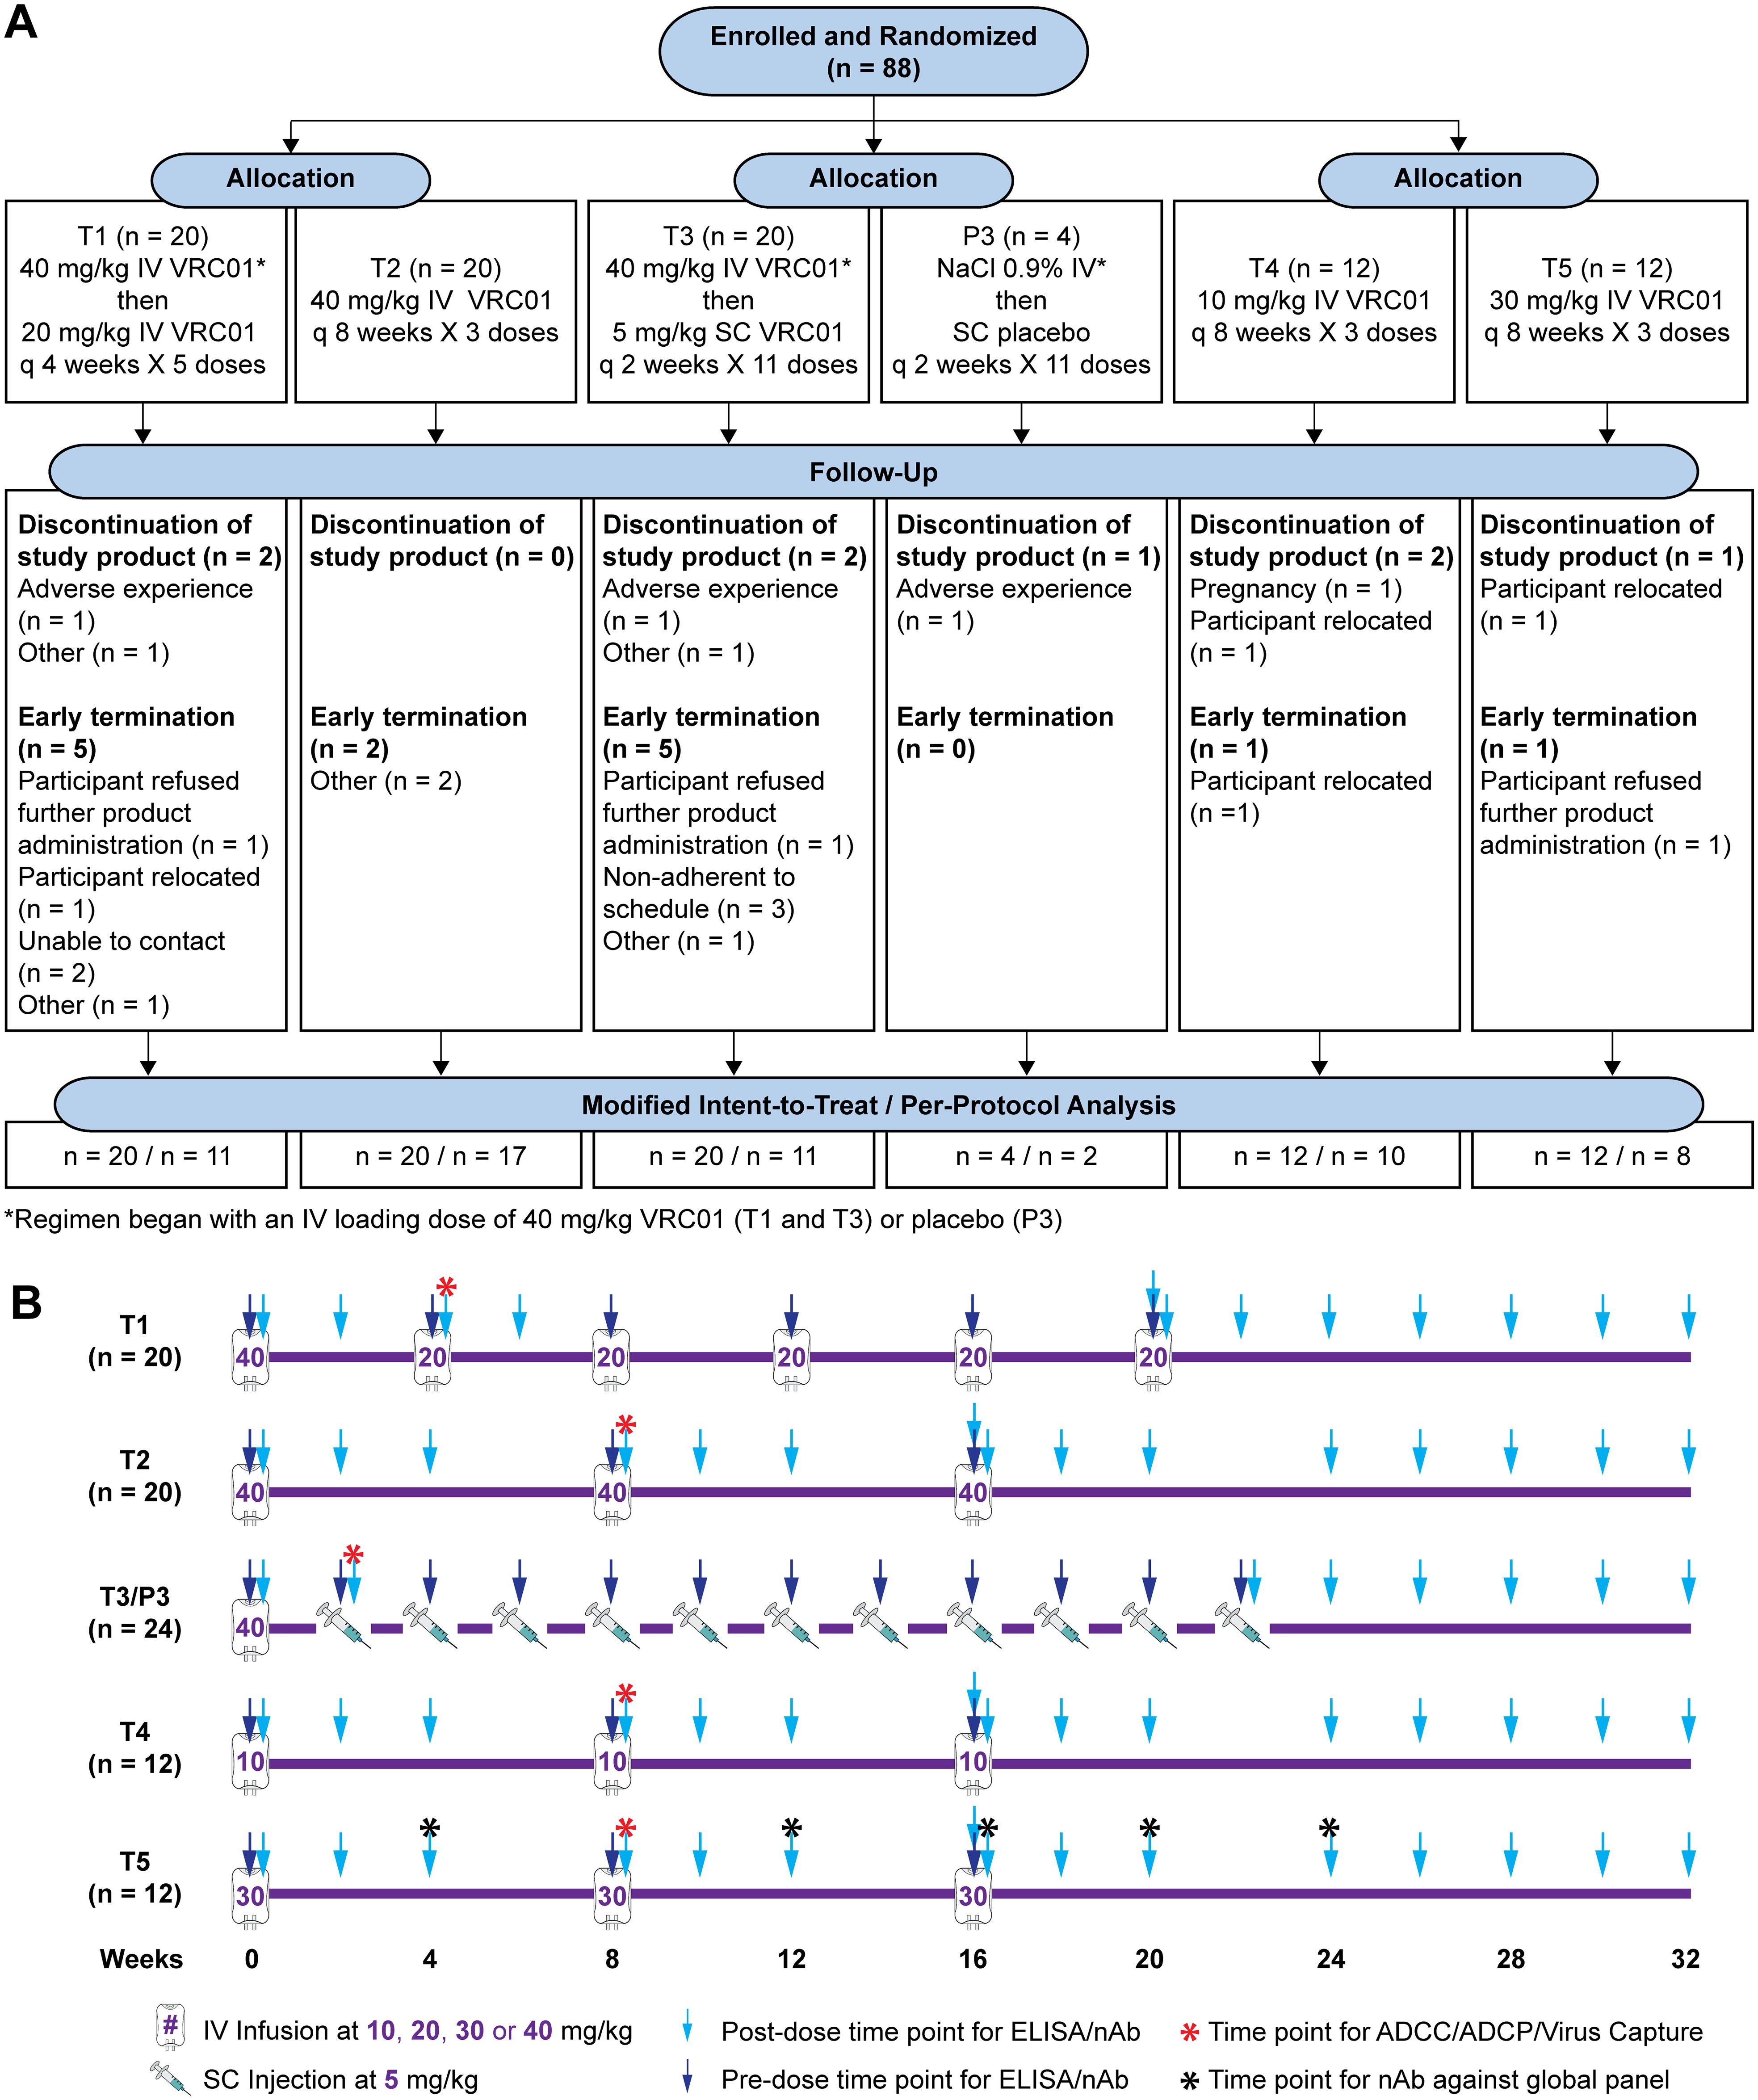 HVTN 104 CONSORT flow diagram (A) and specimen collection schedule (B).